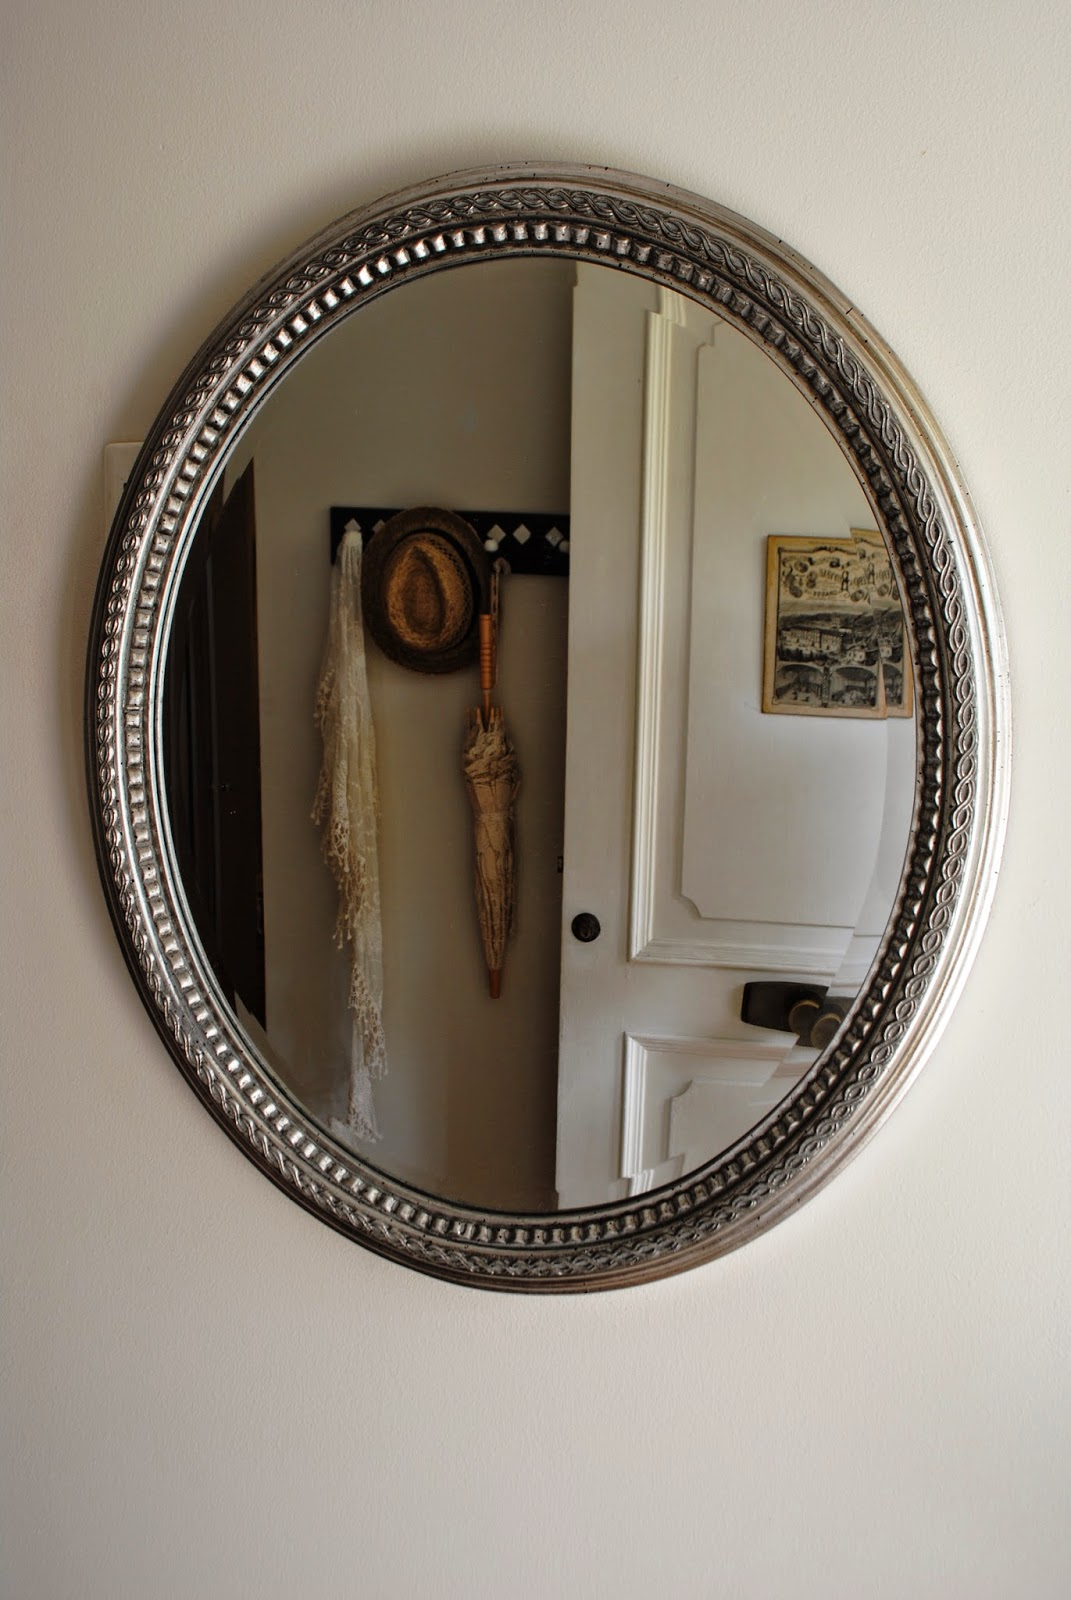 Paz montealegre decoraci n octubre 2014 for Espejo ovalado plata